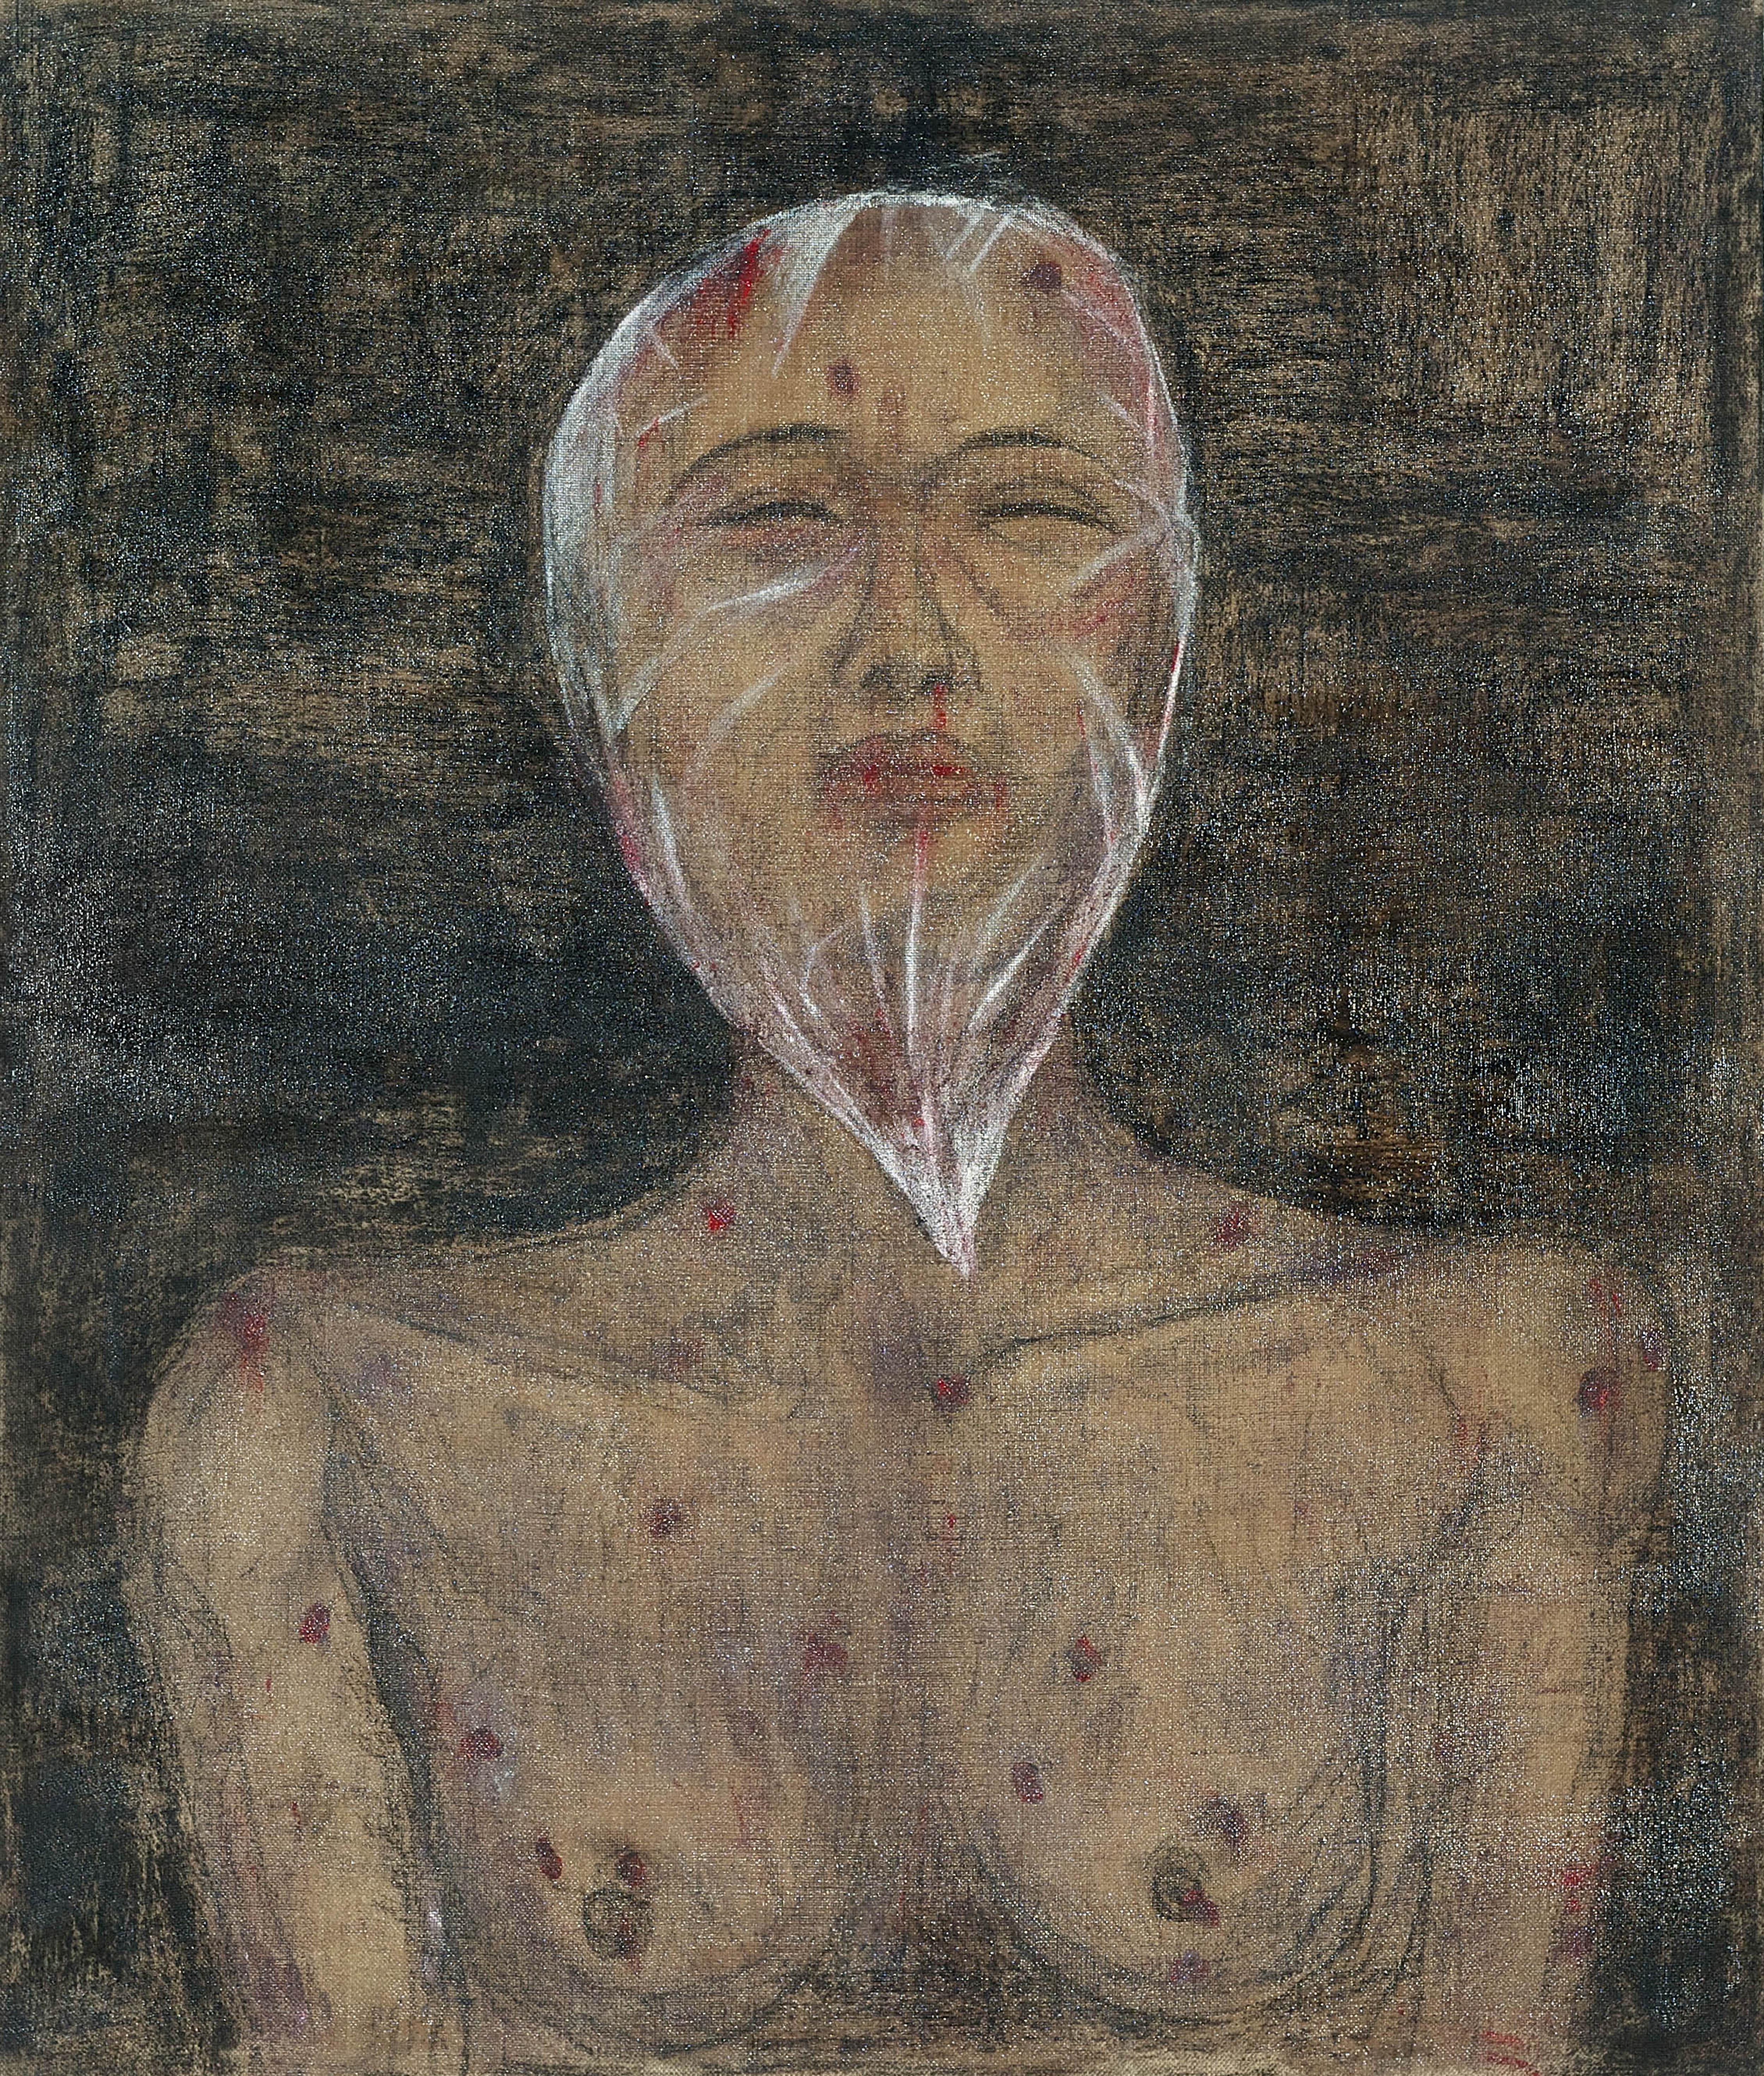 Ciduk, Siksa, Bunuh, Buang V (2018) Acrylic and charcoal on canvas; 170cm x 145cm